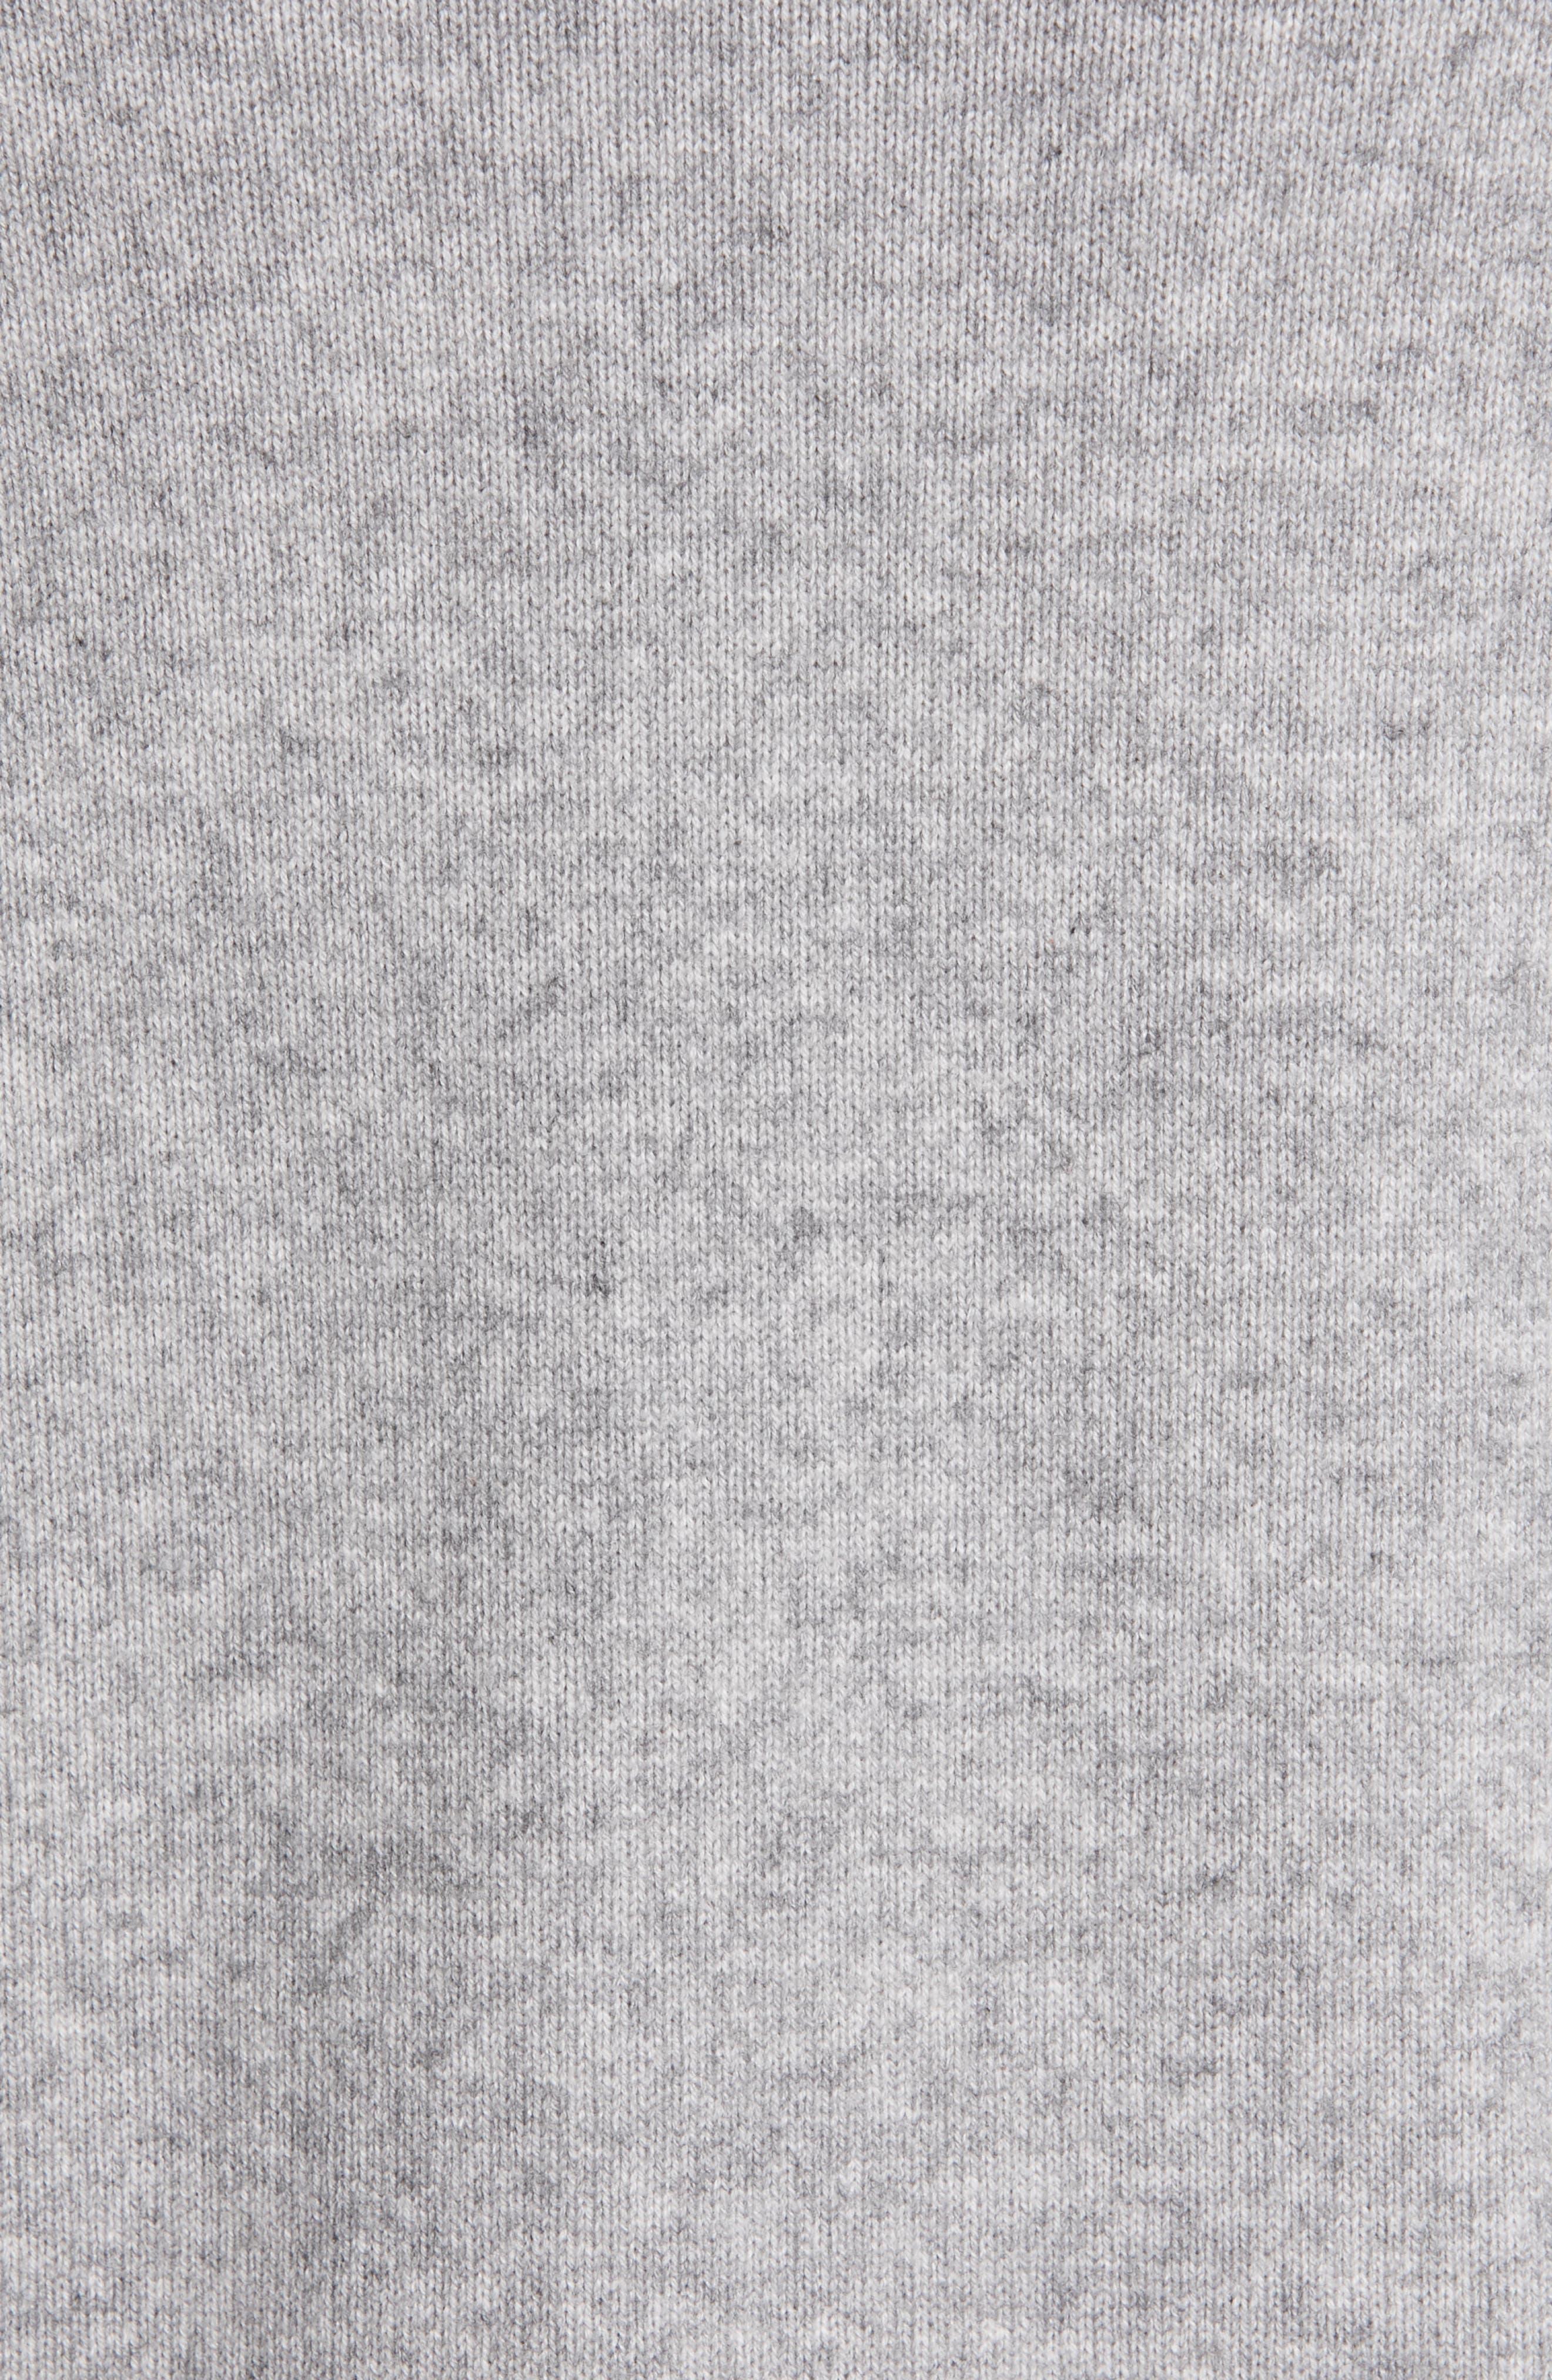 VINCE, Wool & Cashmere Cardigan, Alternate thumbnail 5, color, H STEEL